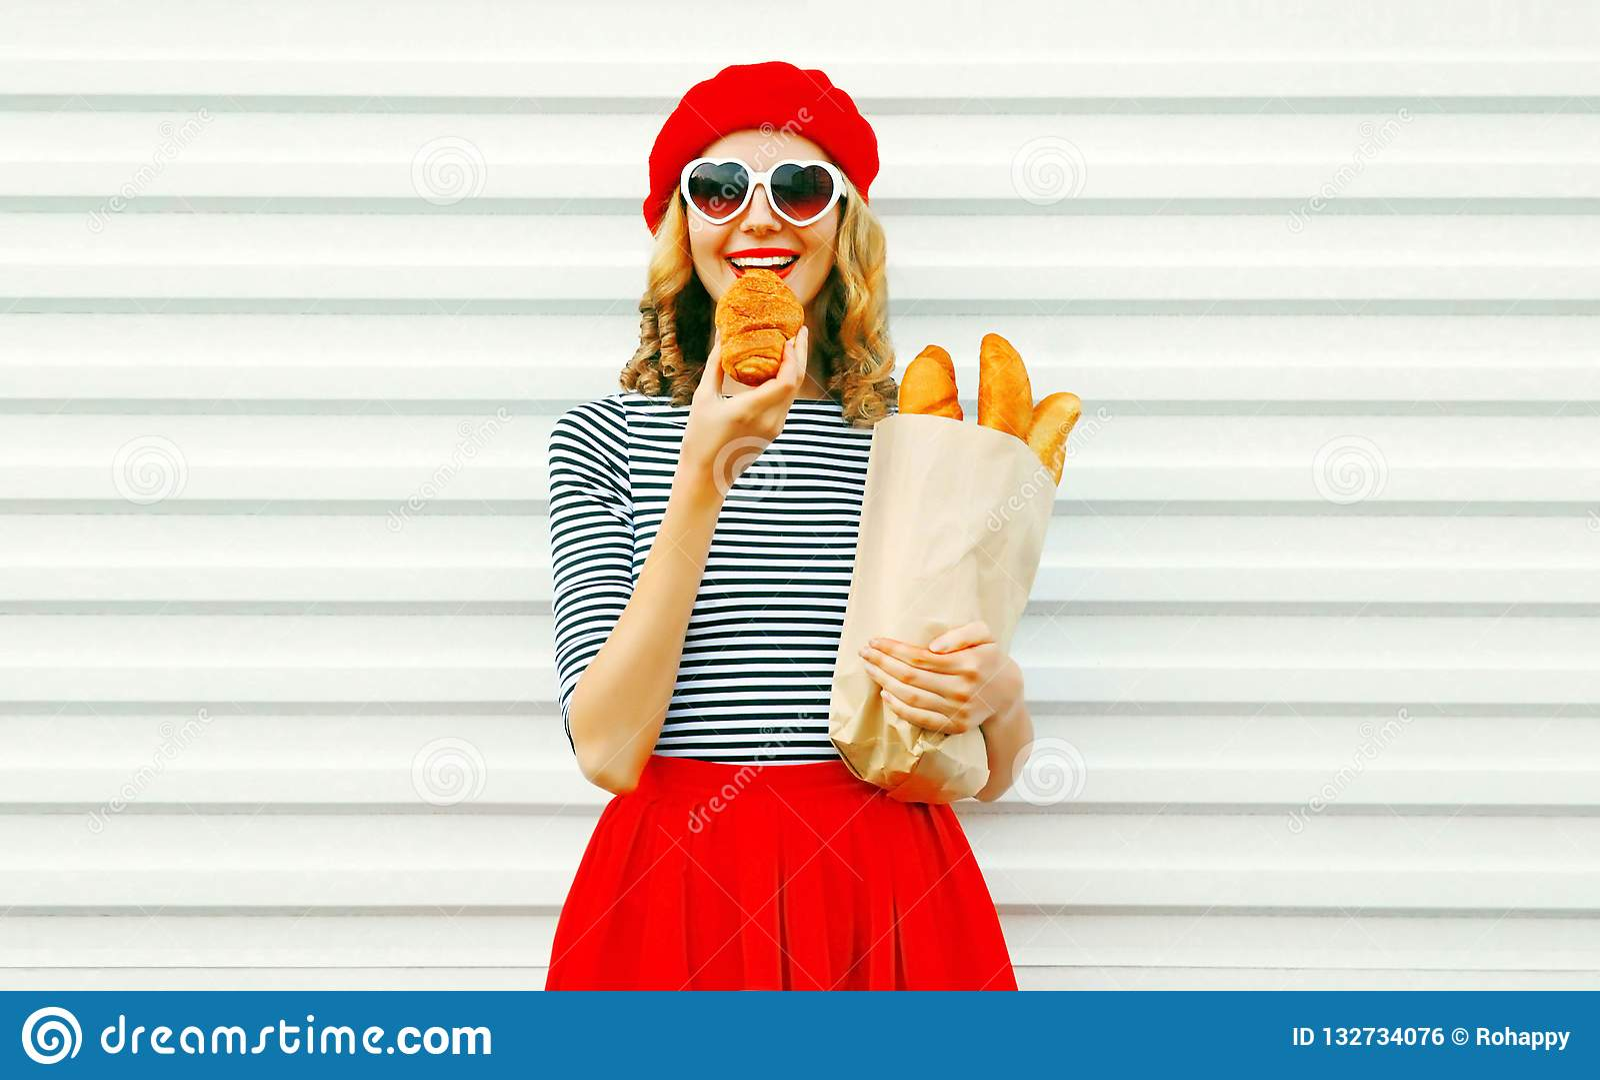 Portrait happy woman eating croissant holding paper bag with lon